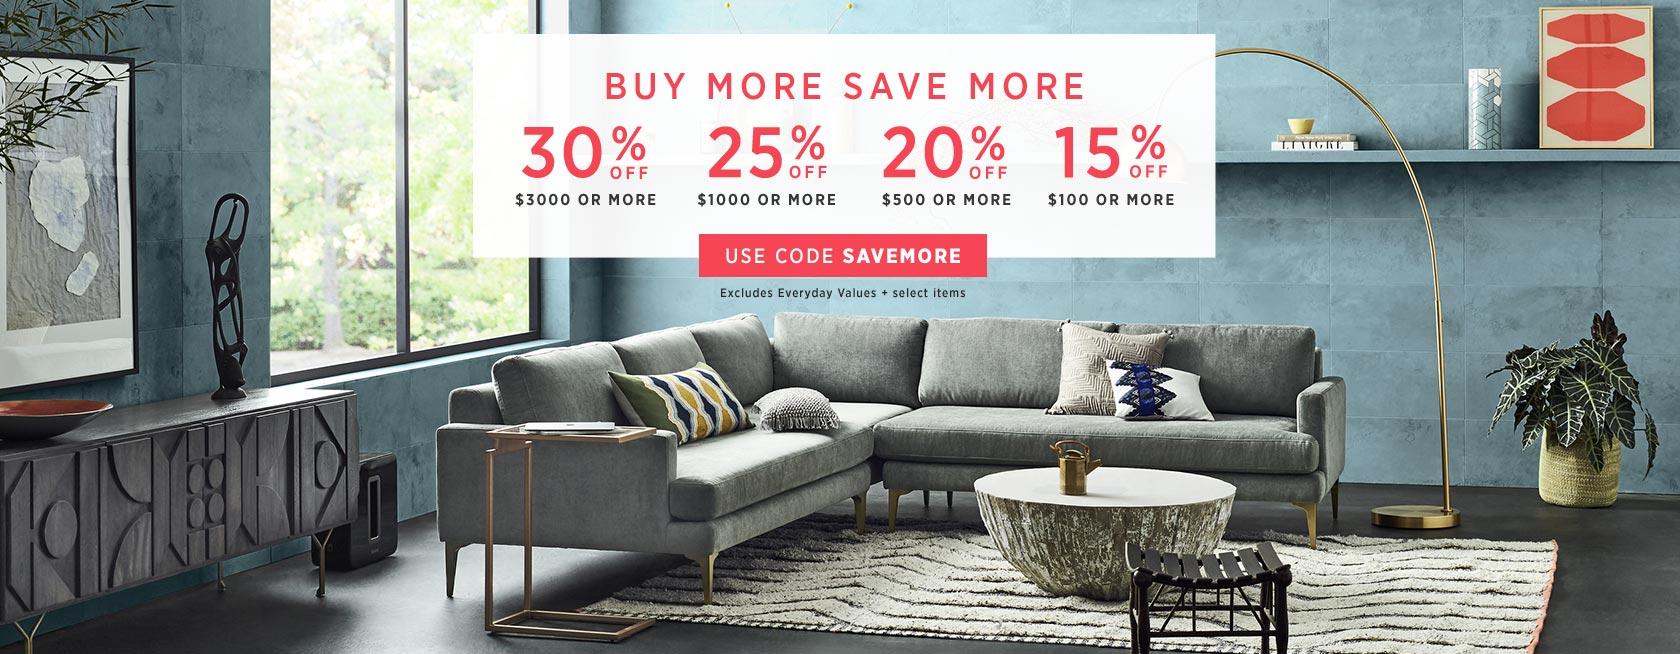 Buy More Save More! Use Code SAVEMORE